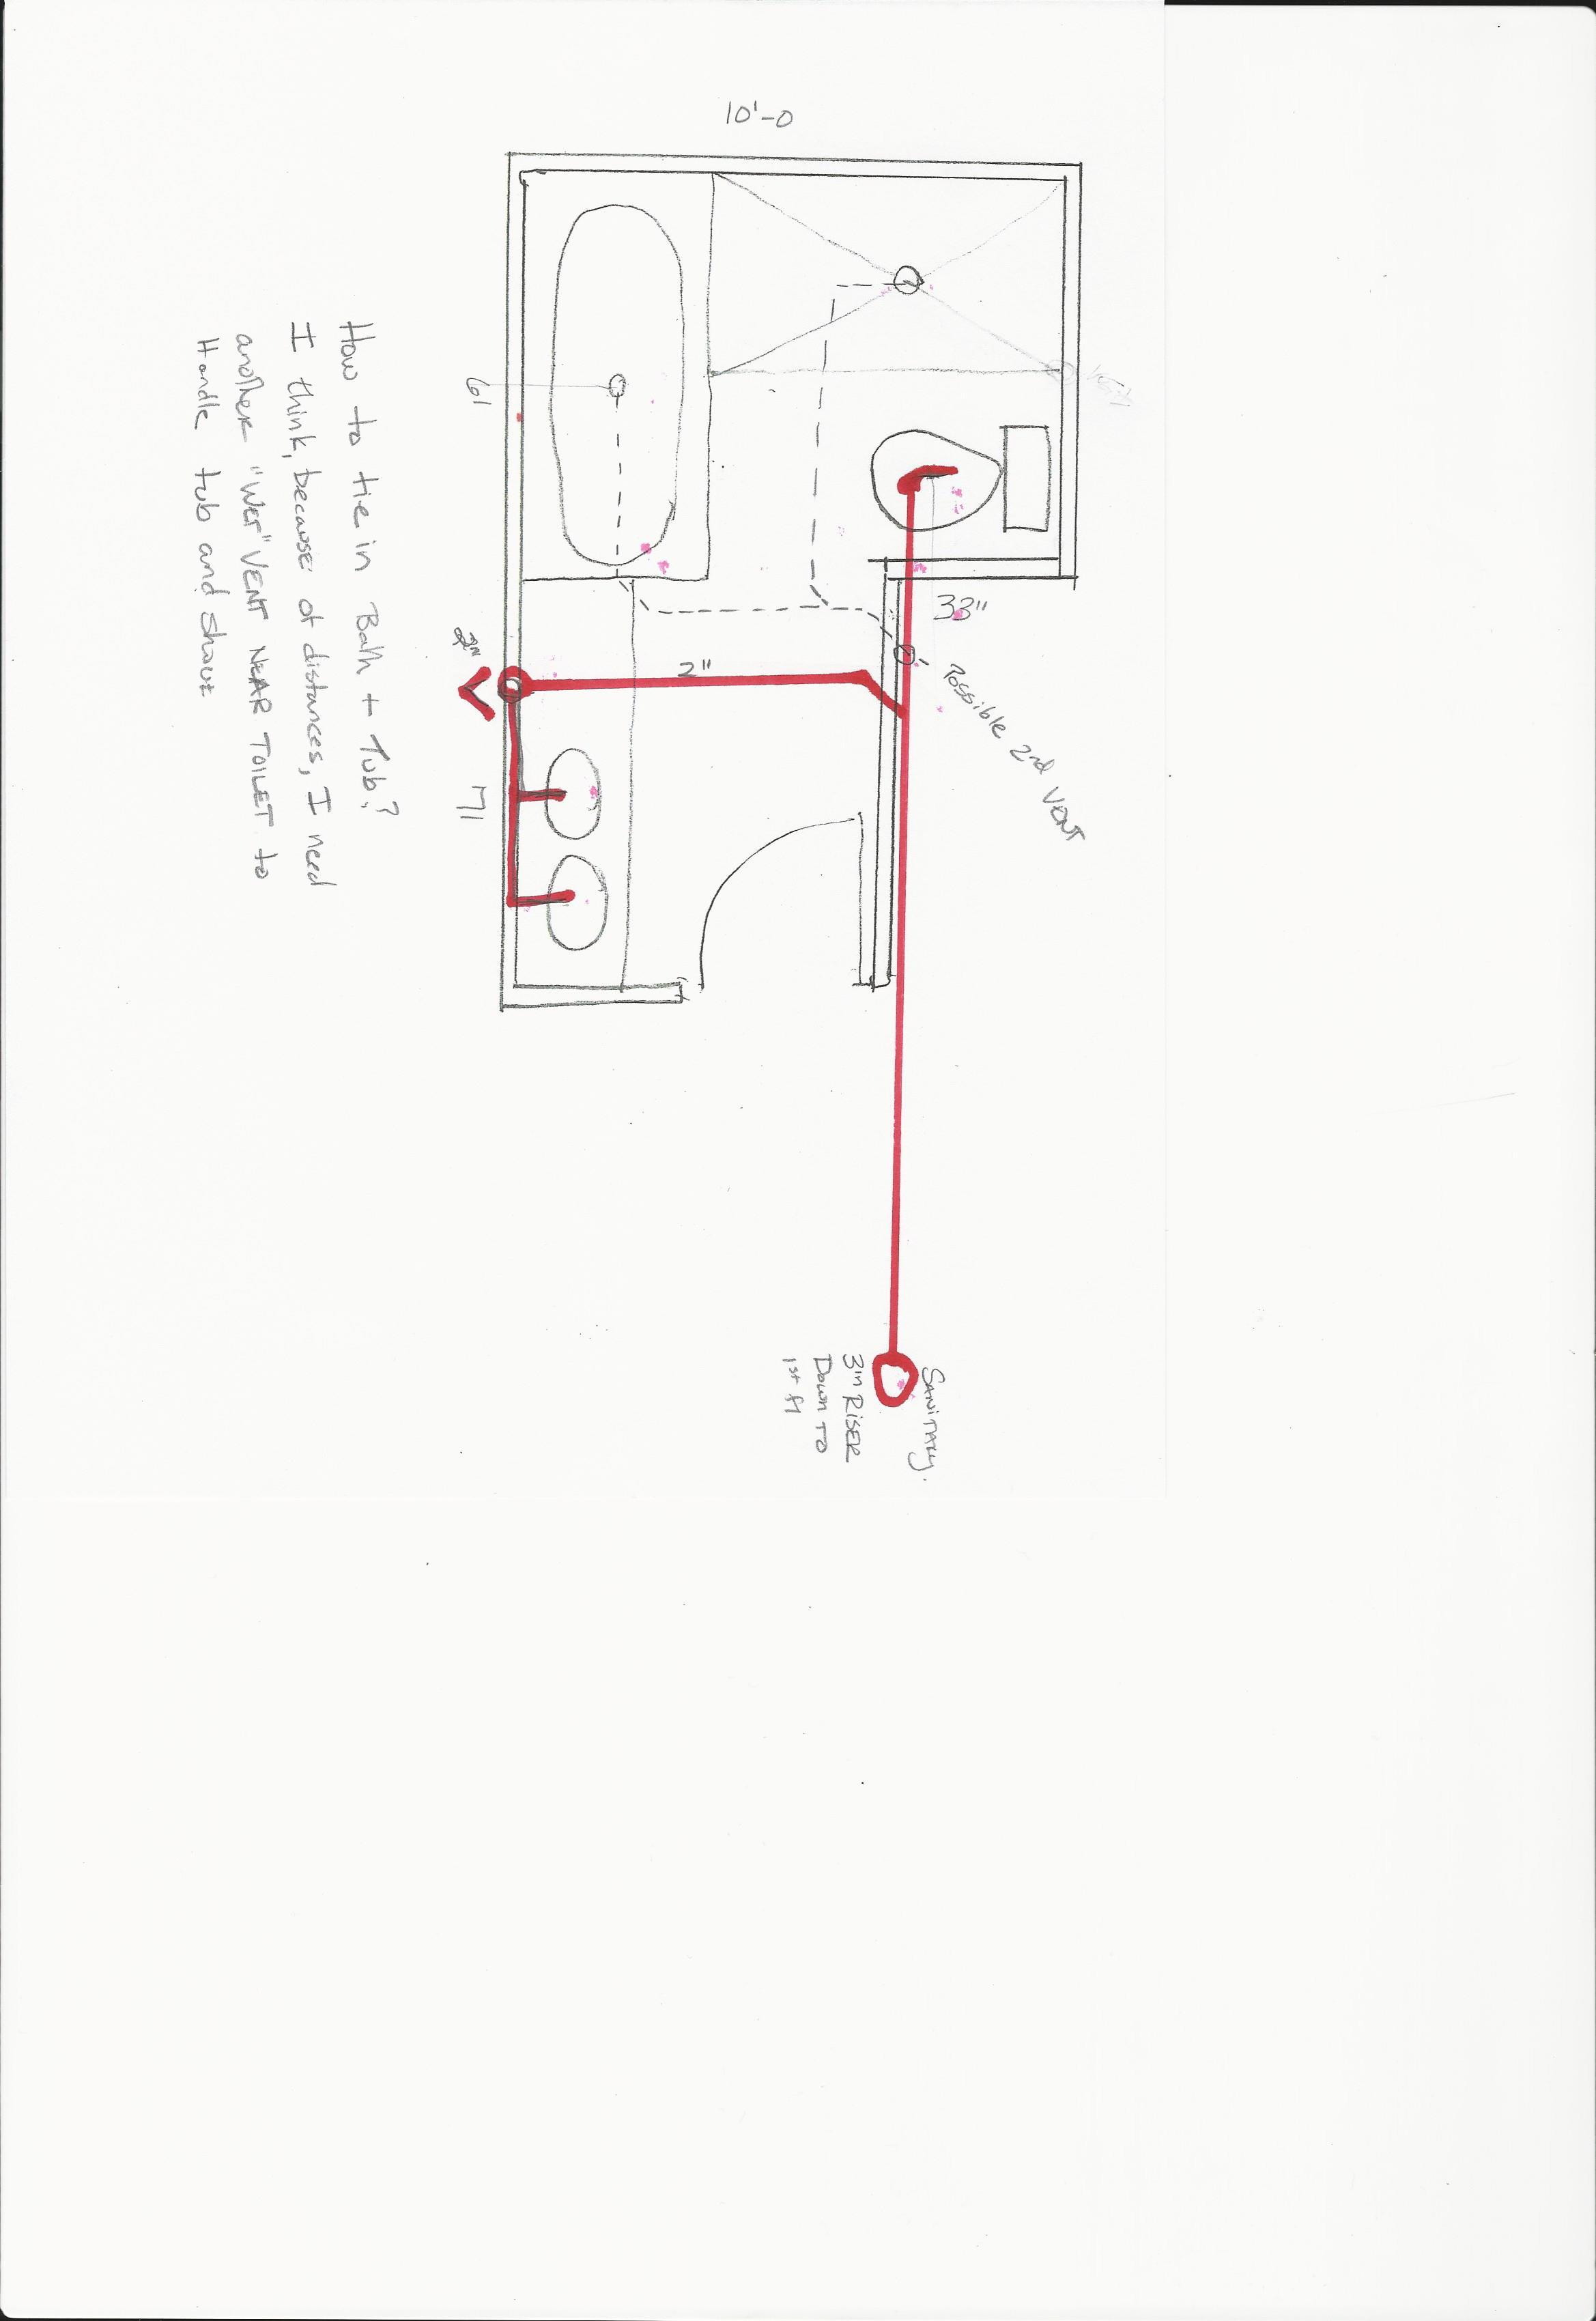 plumbing sanitary riser diagram suzuki gsxr 750 wiring wet vent